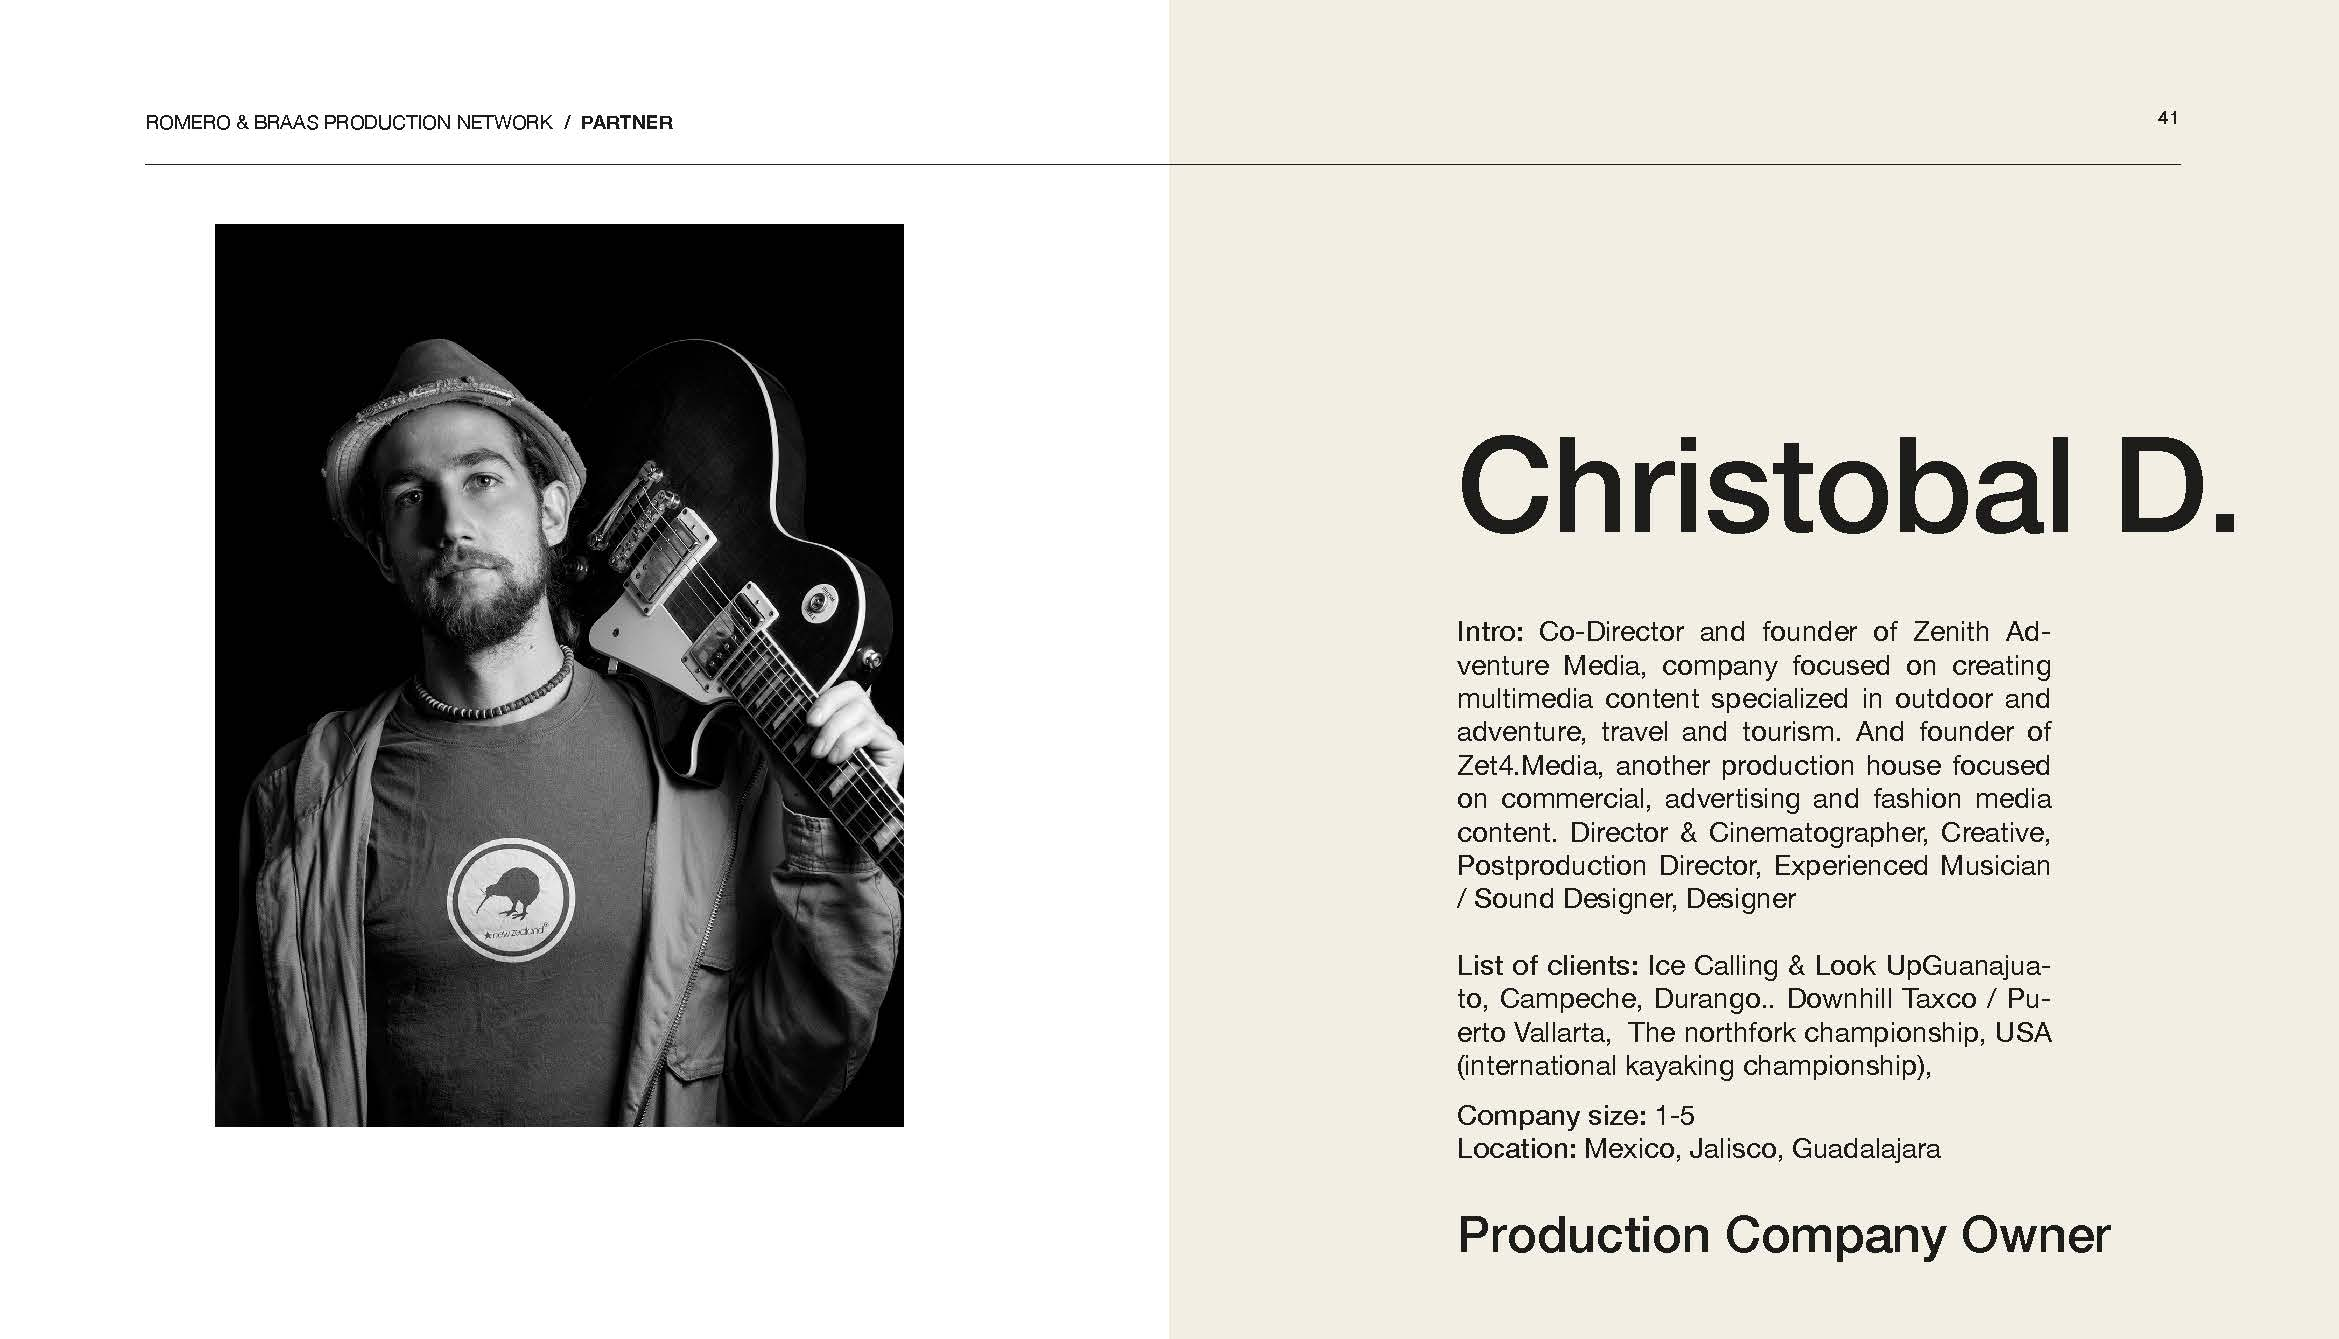 Production_Network_romeroandbraas_Seite_41.jpg